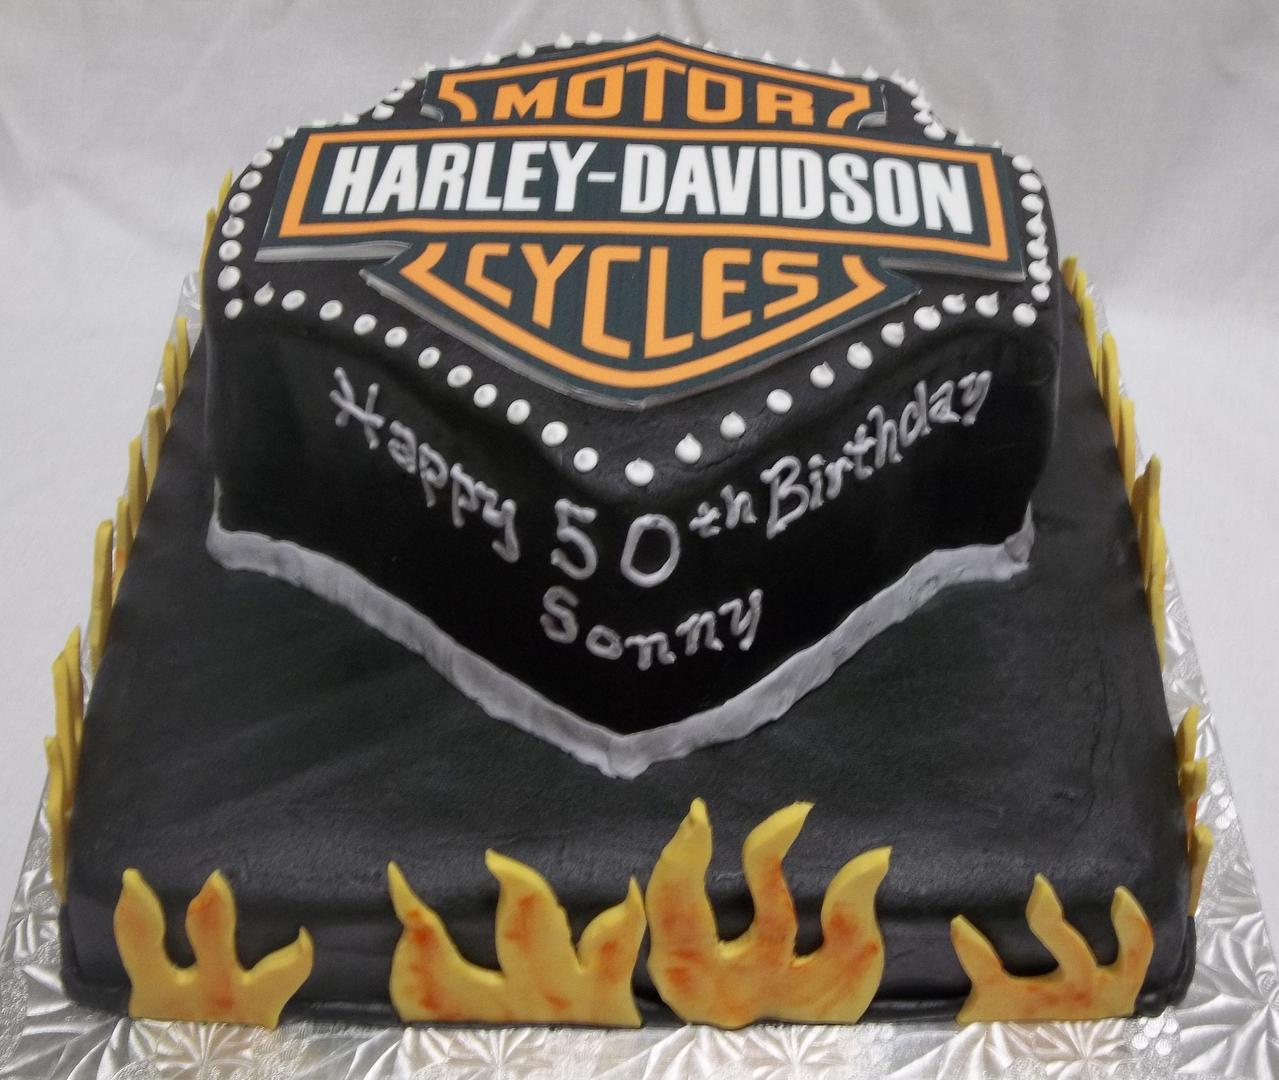 Harley Davidson Cake Decorations Mens Cakes 1 Trucks Cars Planes Train Tools Welding